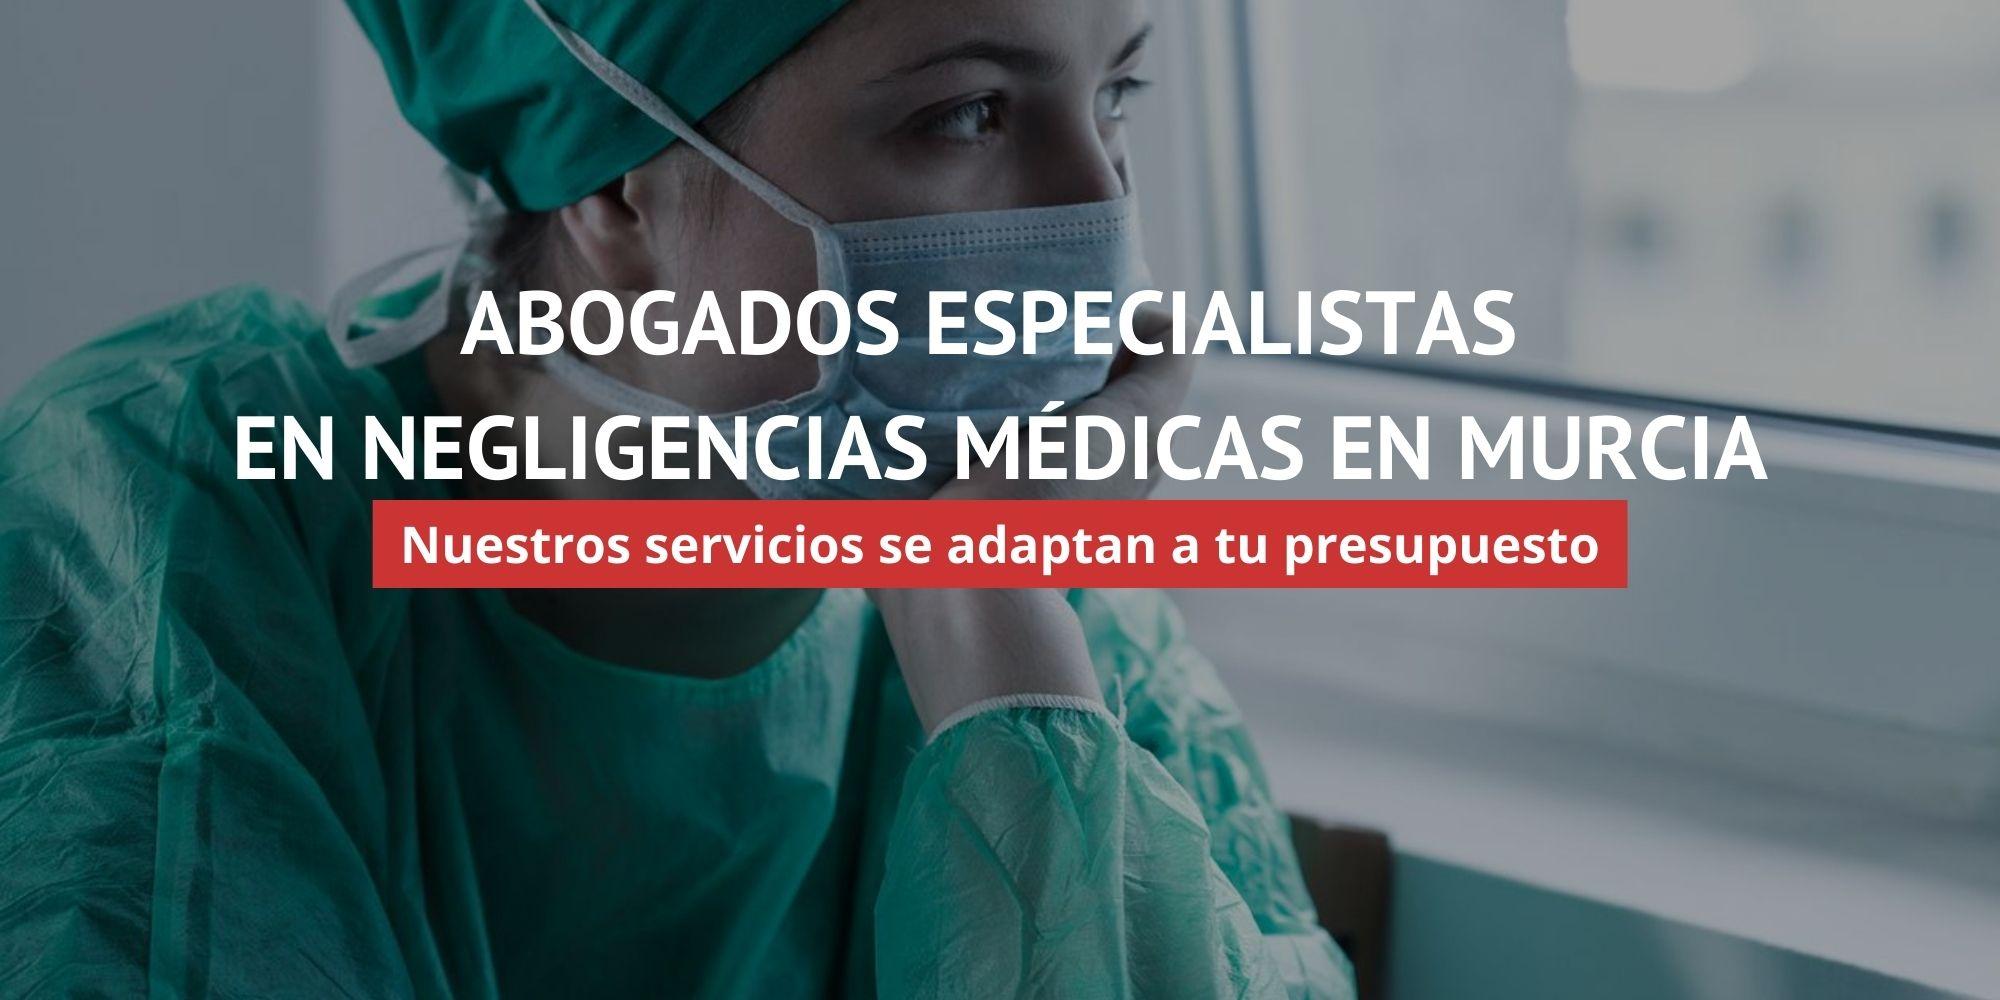 Abogados Negligencias Médicas Murcia - Primera Visita Gratis | ACC LEGAL ABOGADOS